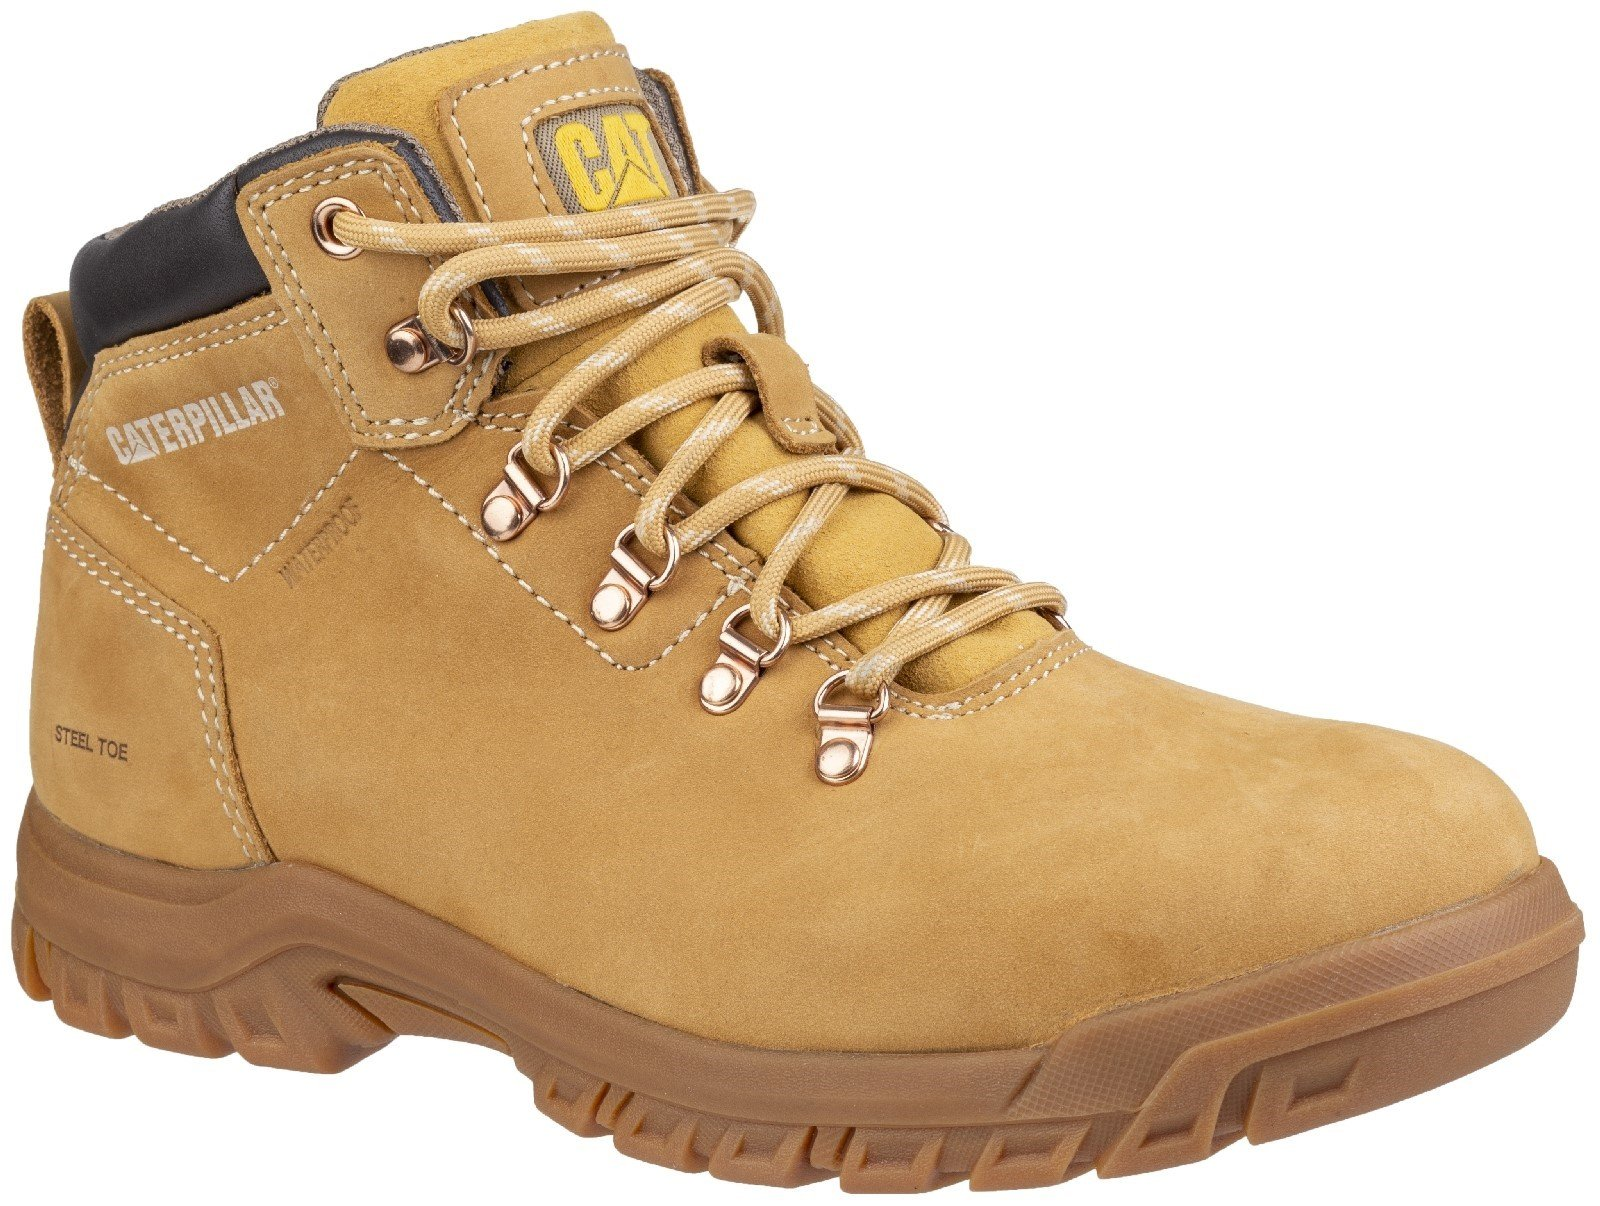 Caterpillar Women's Mae Lace Up Safety Boot Honey 28171 - Honey 3